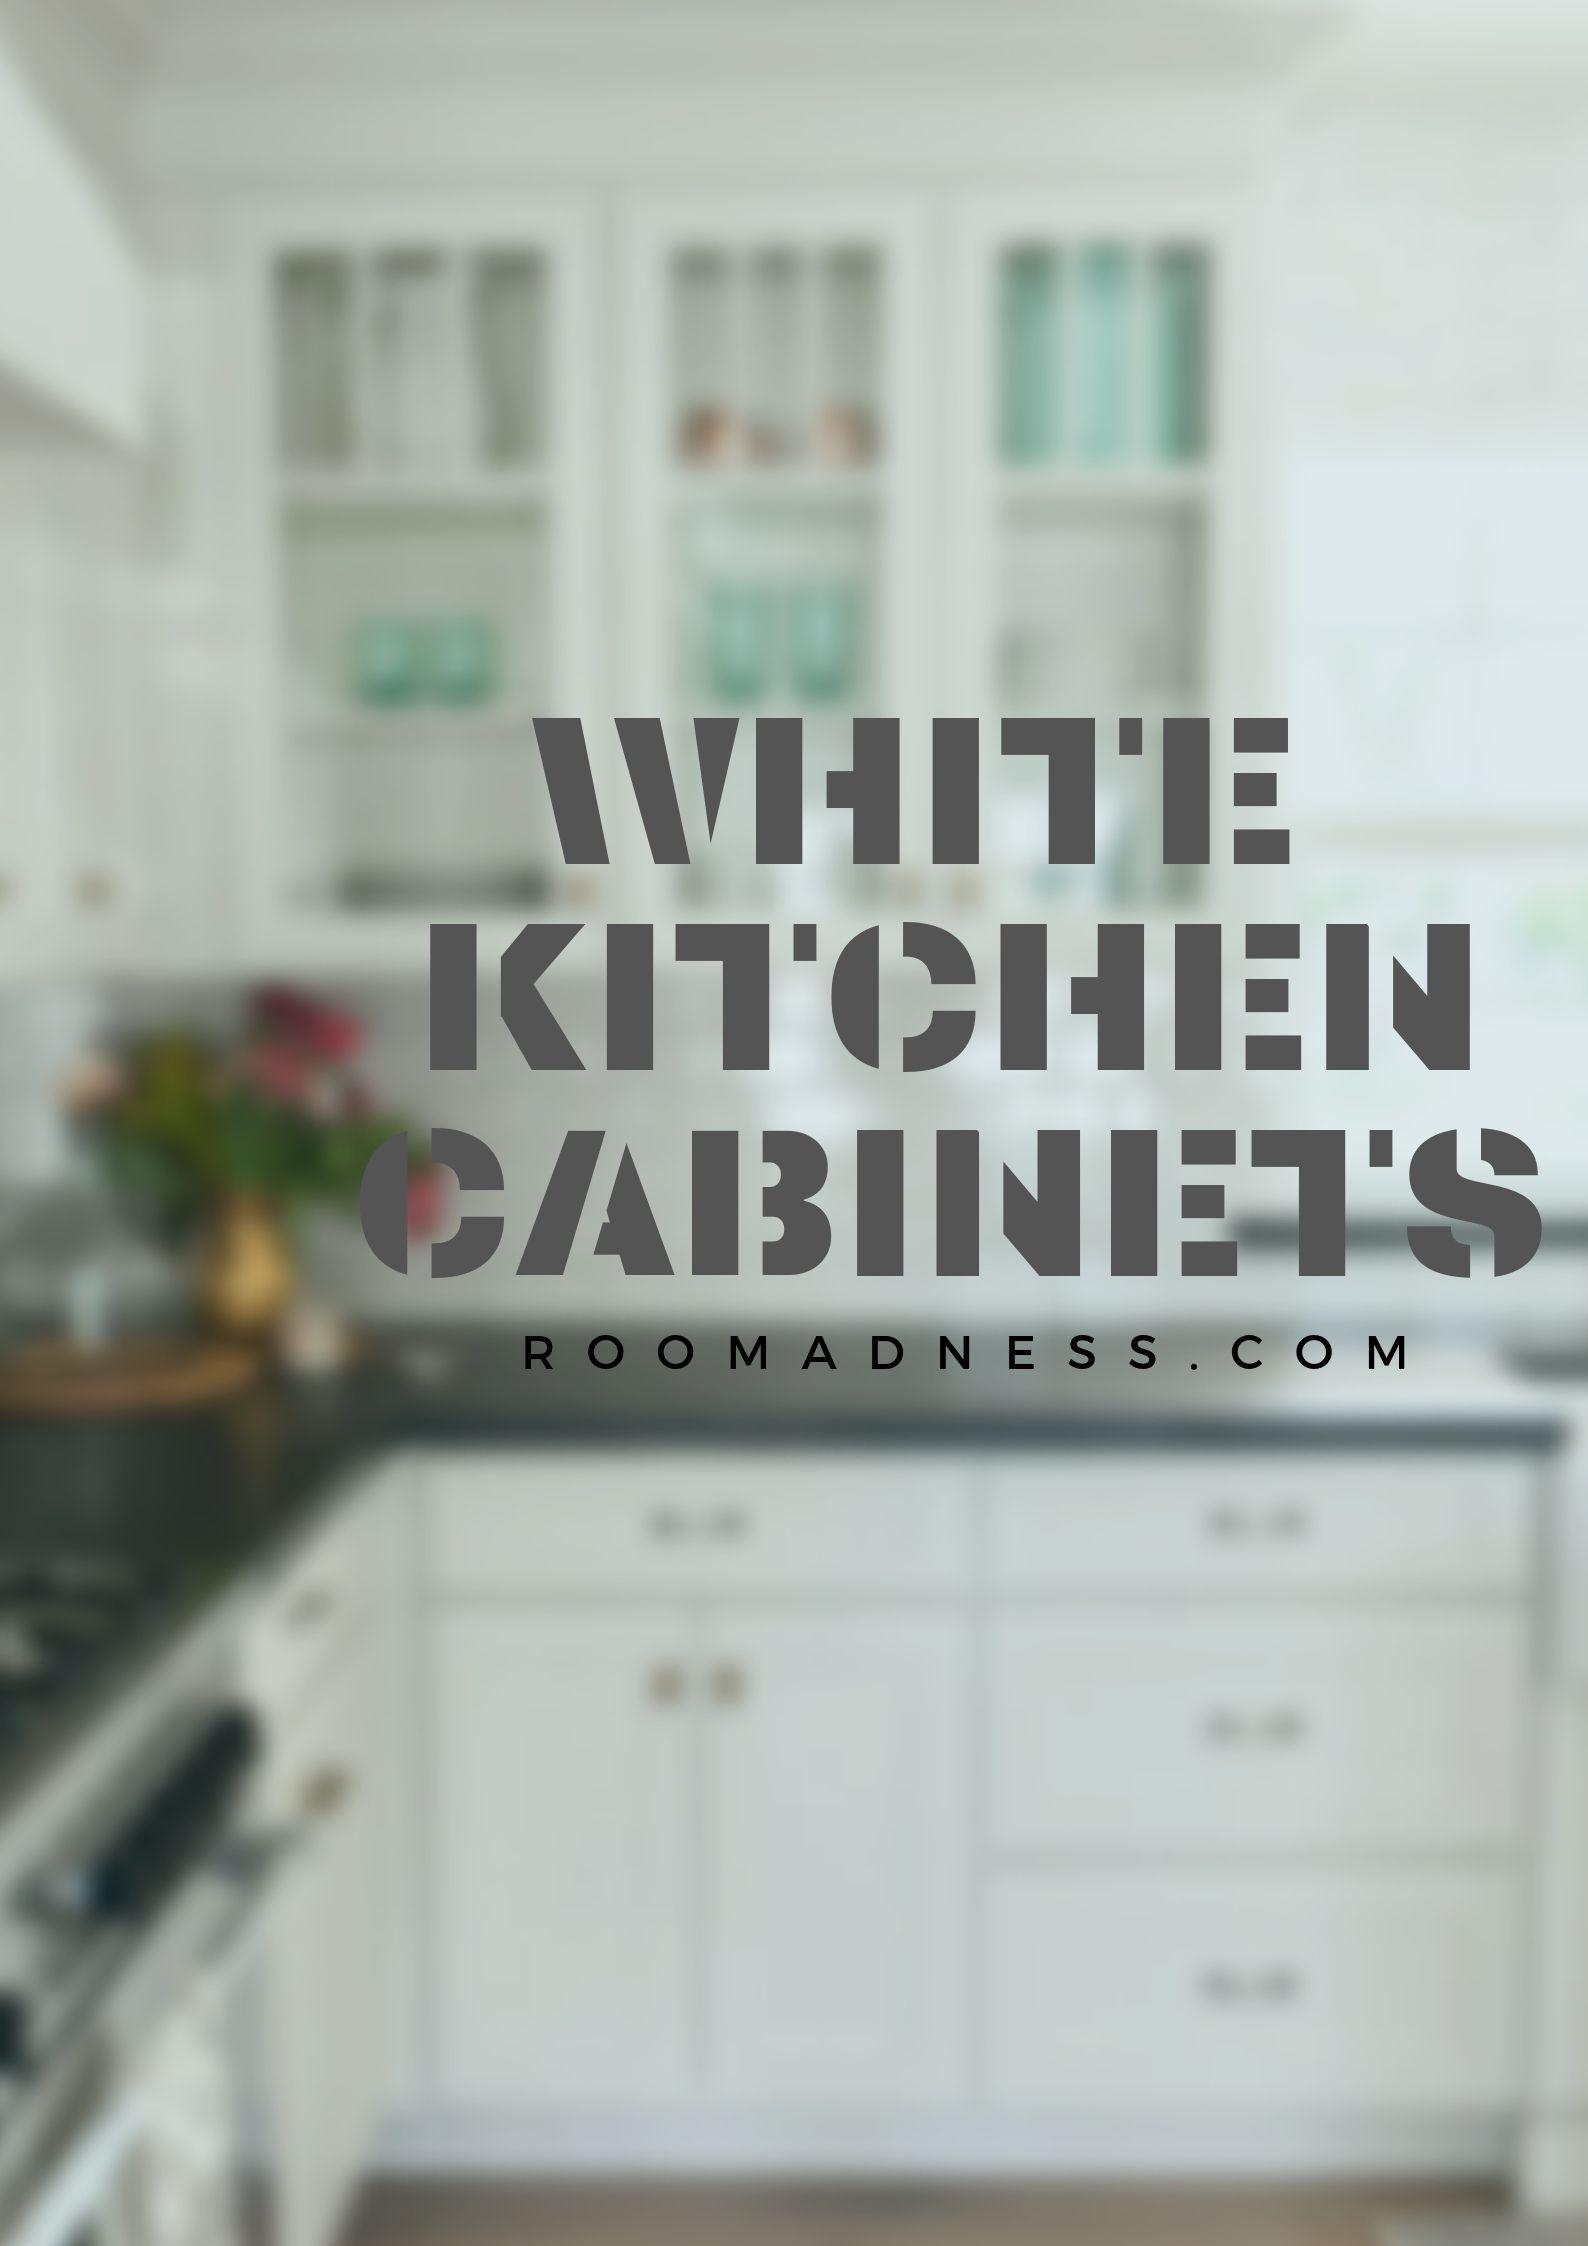 Farmhouse kitchen cabinets (1)